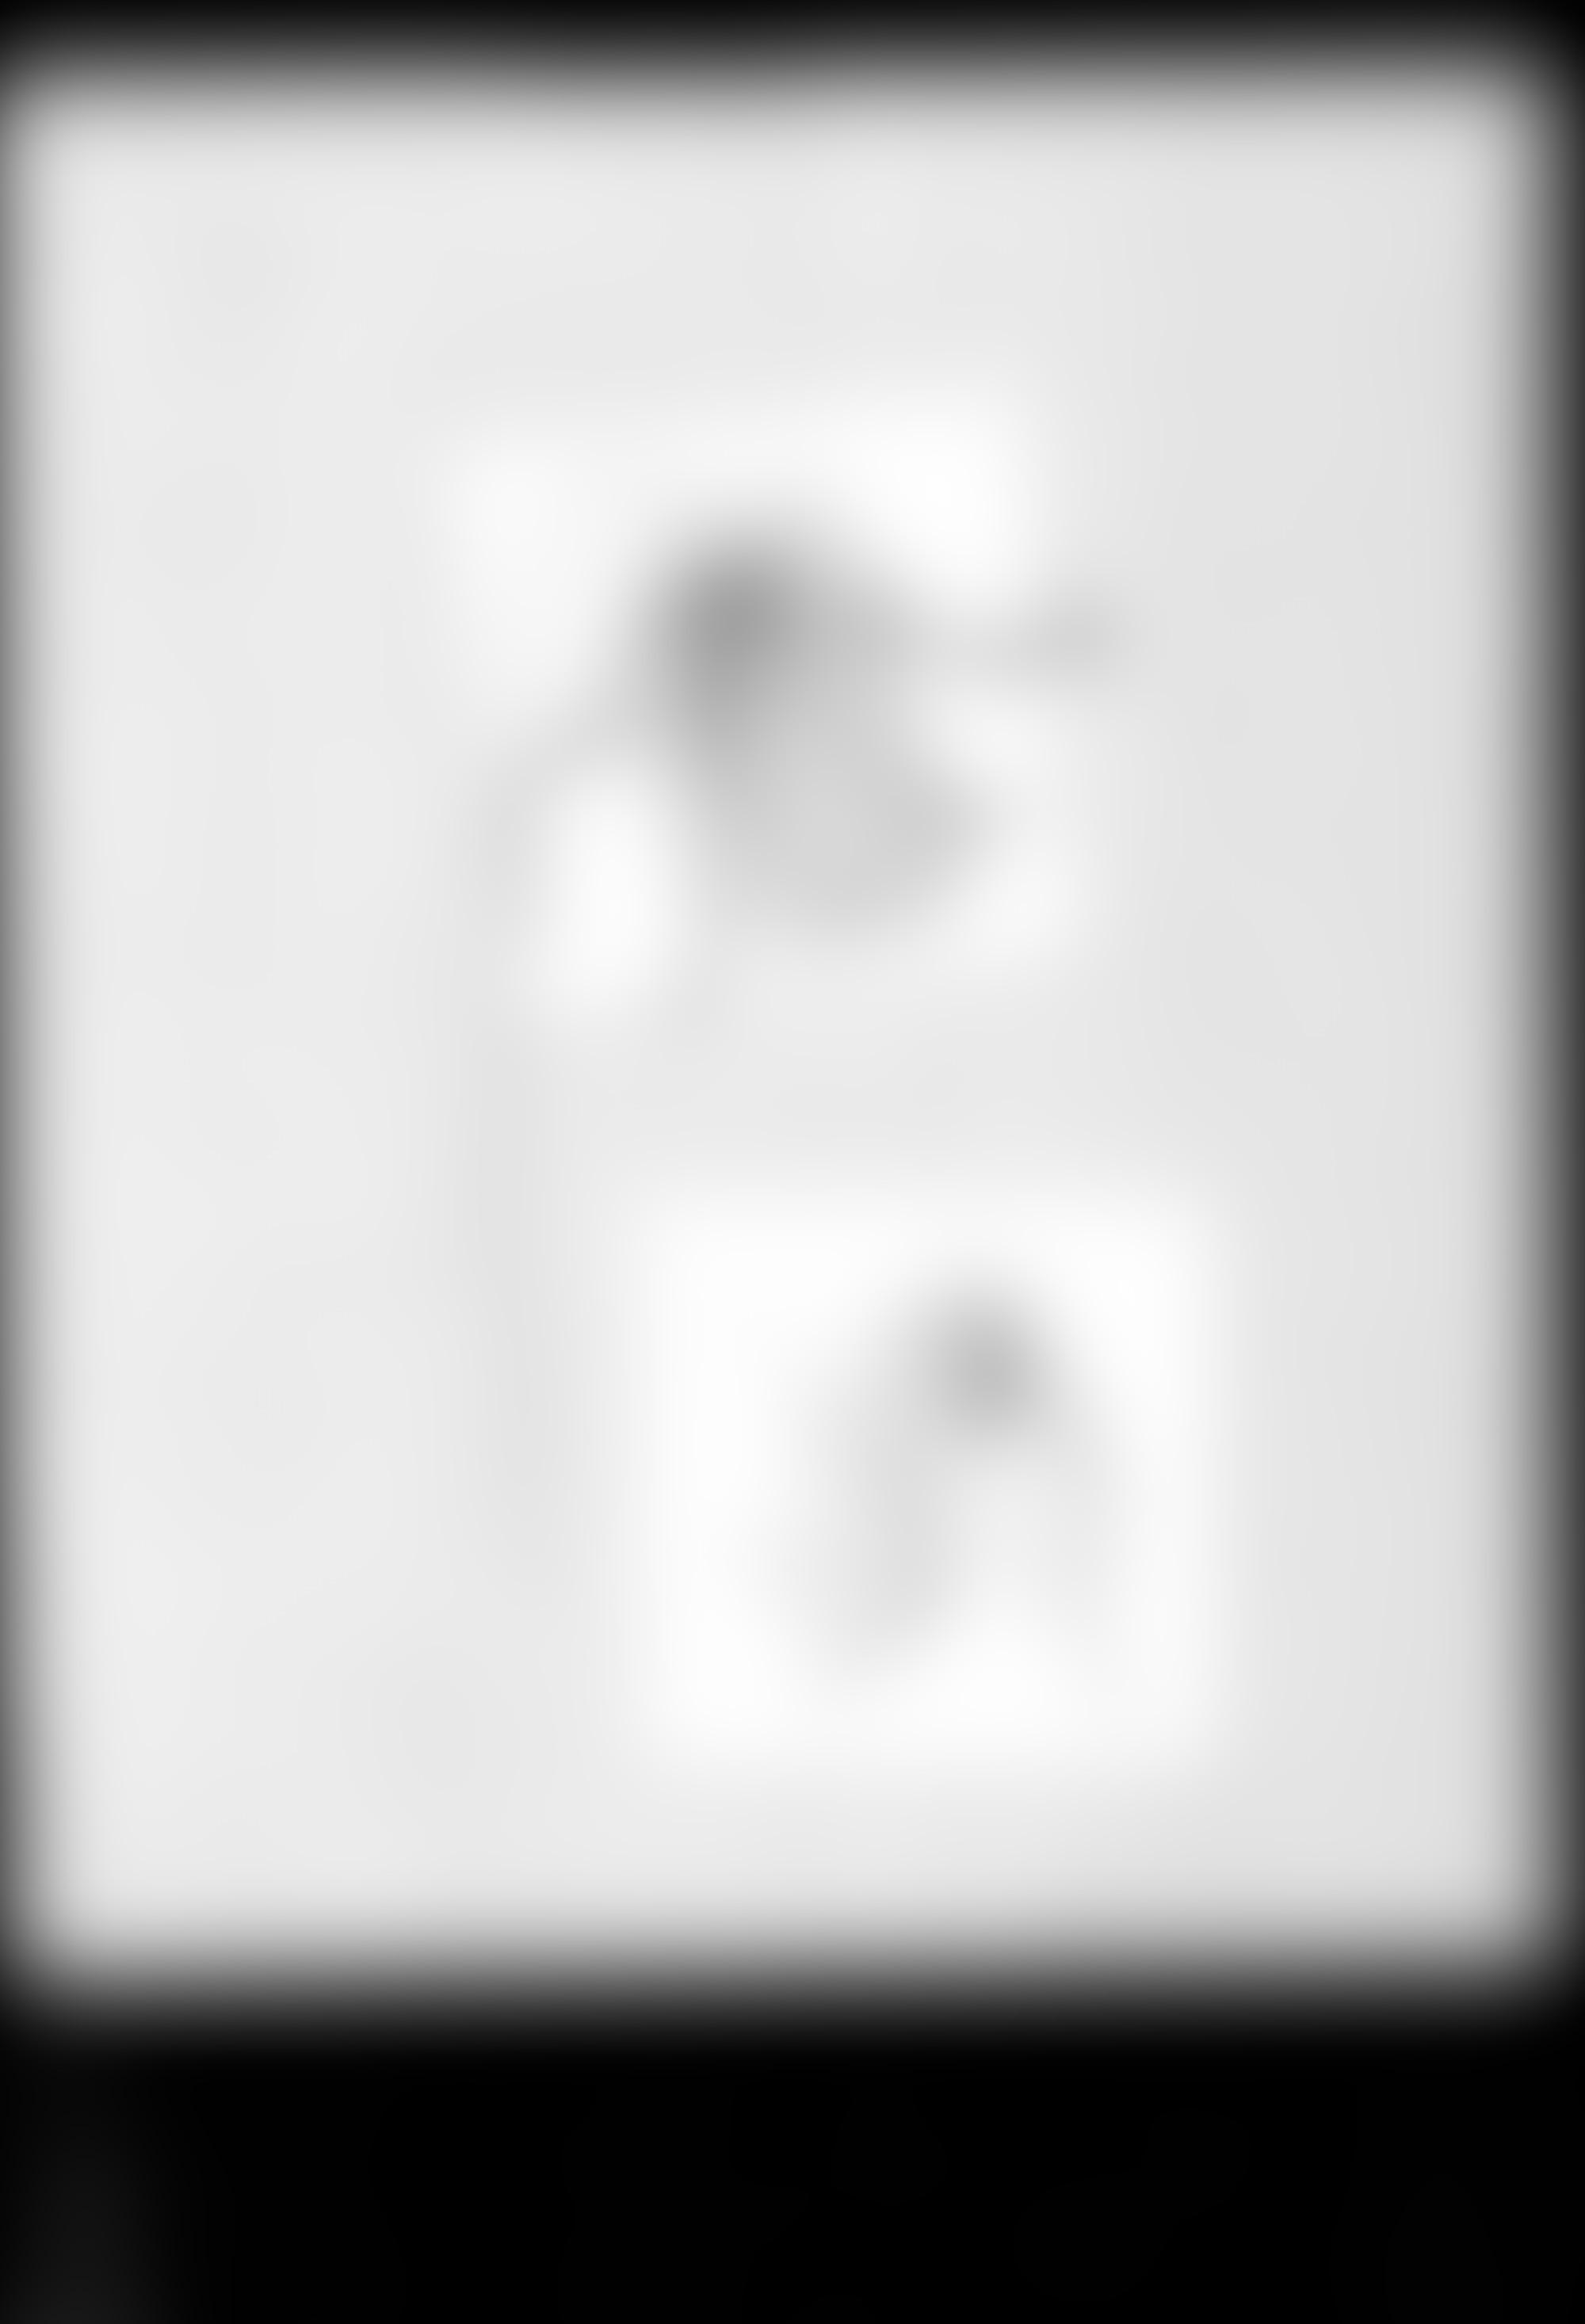 Paula castro fleabag illustration lecture in progress 13 autocompressfitresizeixlibphp 1 1 0max h2000max w3 D2000q80s47784e96e8d4bce4ec7c8ca684b31673